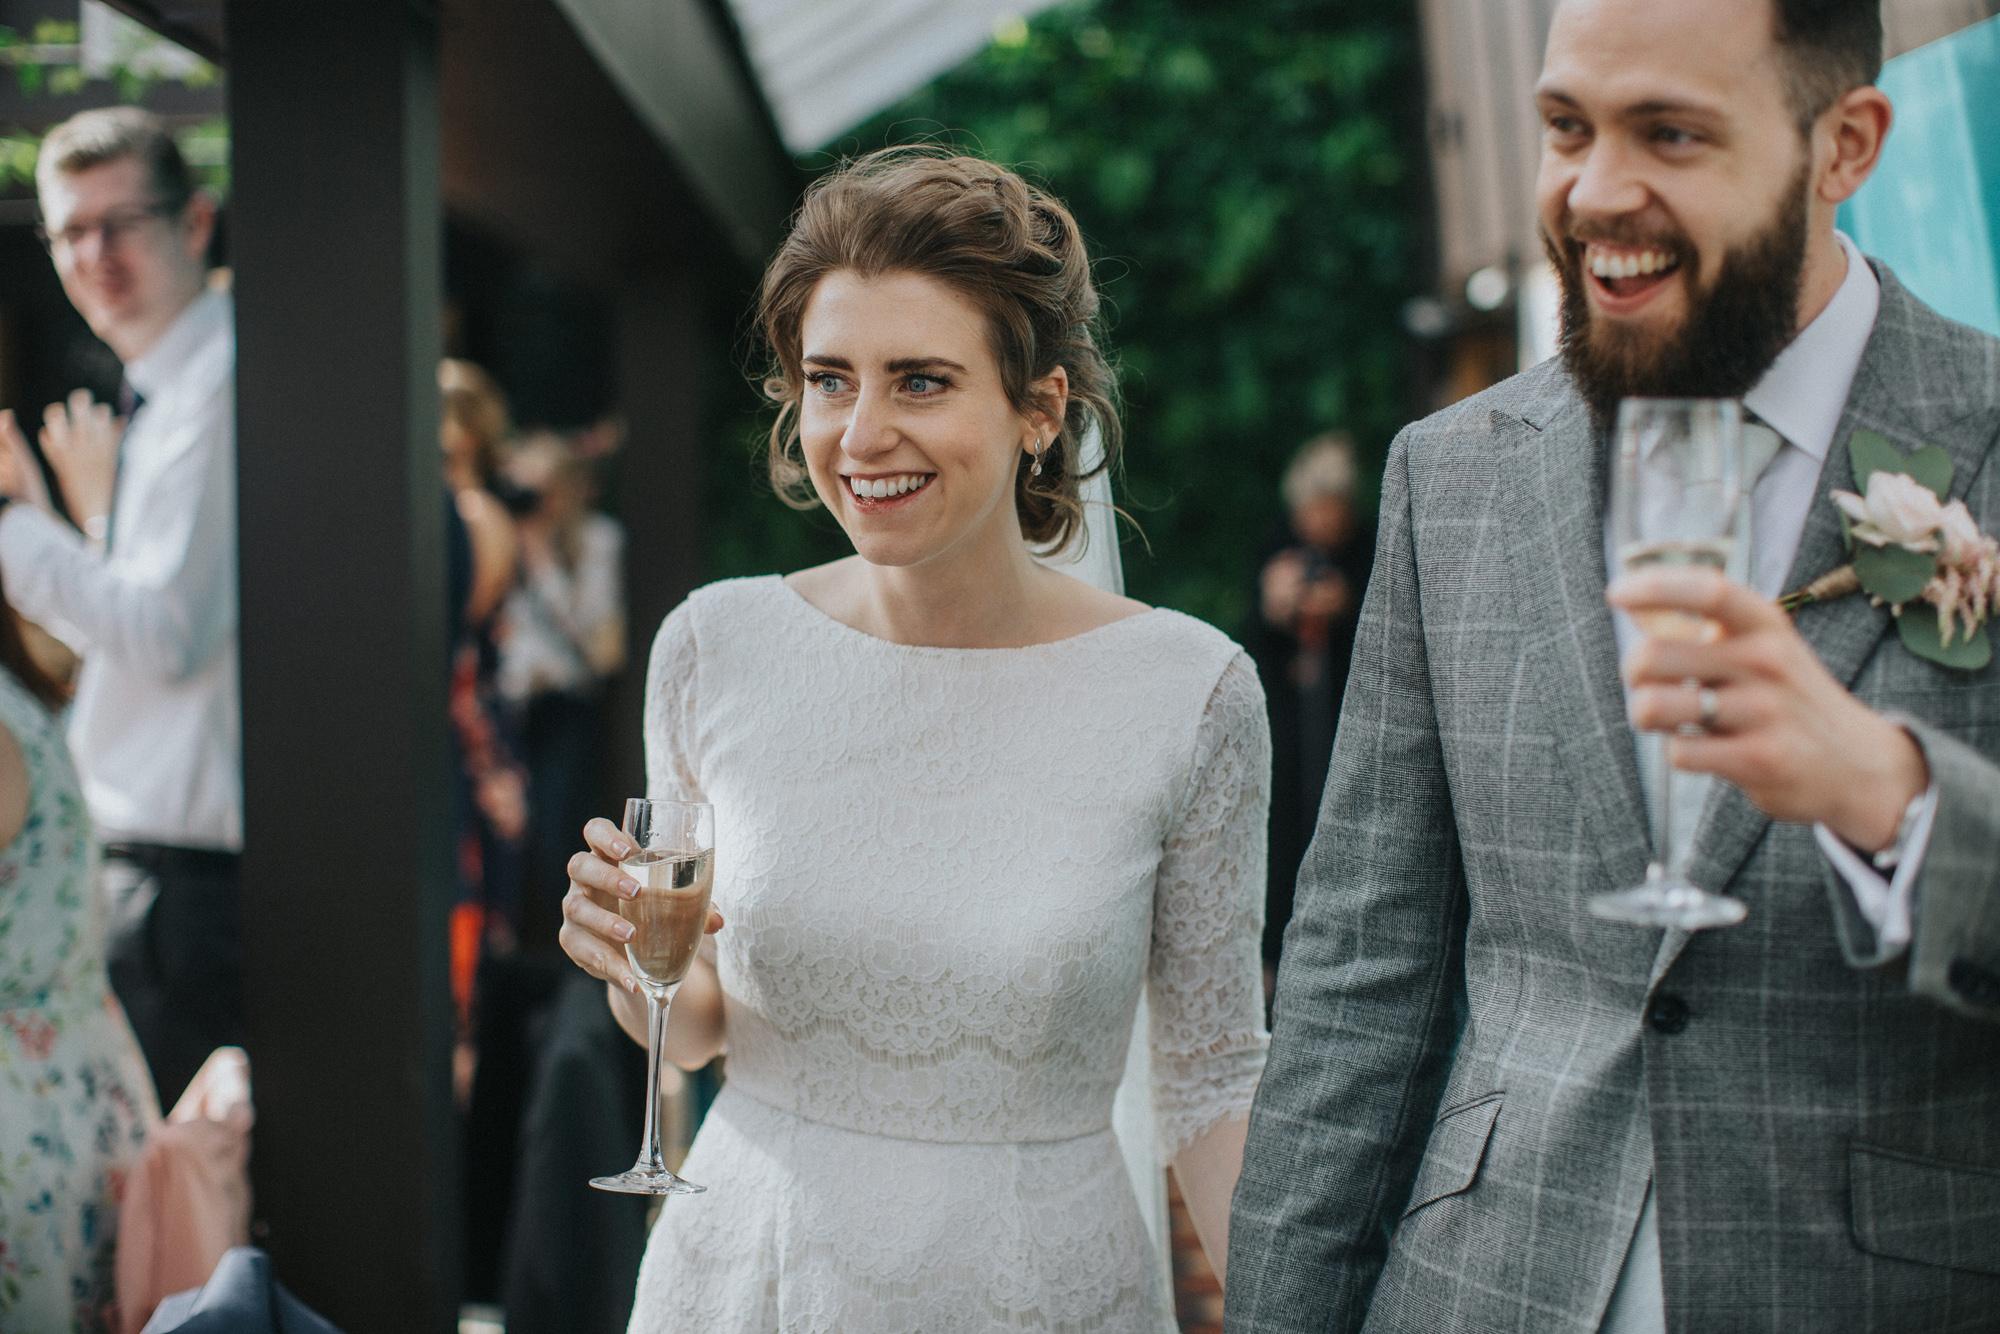 Kate-Beaumont-Lace-Flared-Dahlia-Gown-Leeds-Wedding-Bloom-Weddings-48.jpg